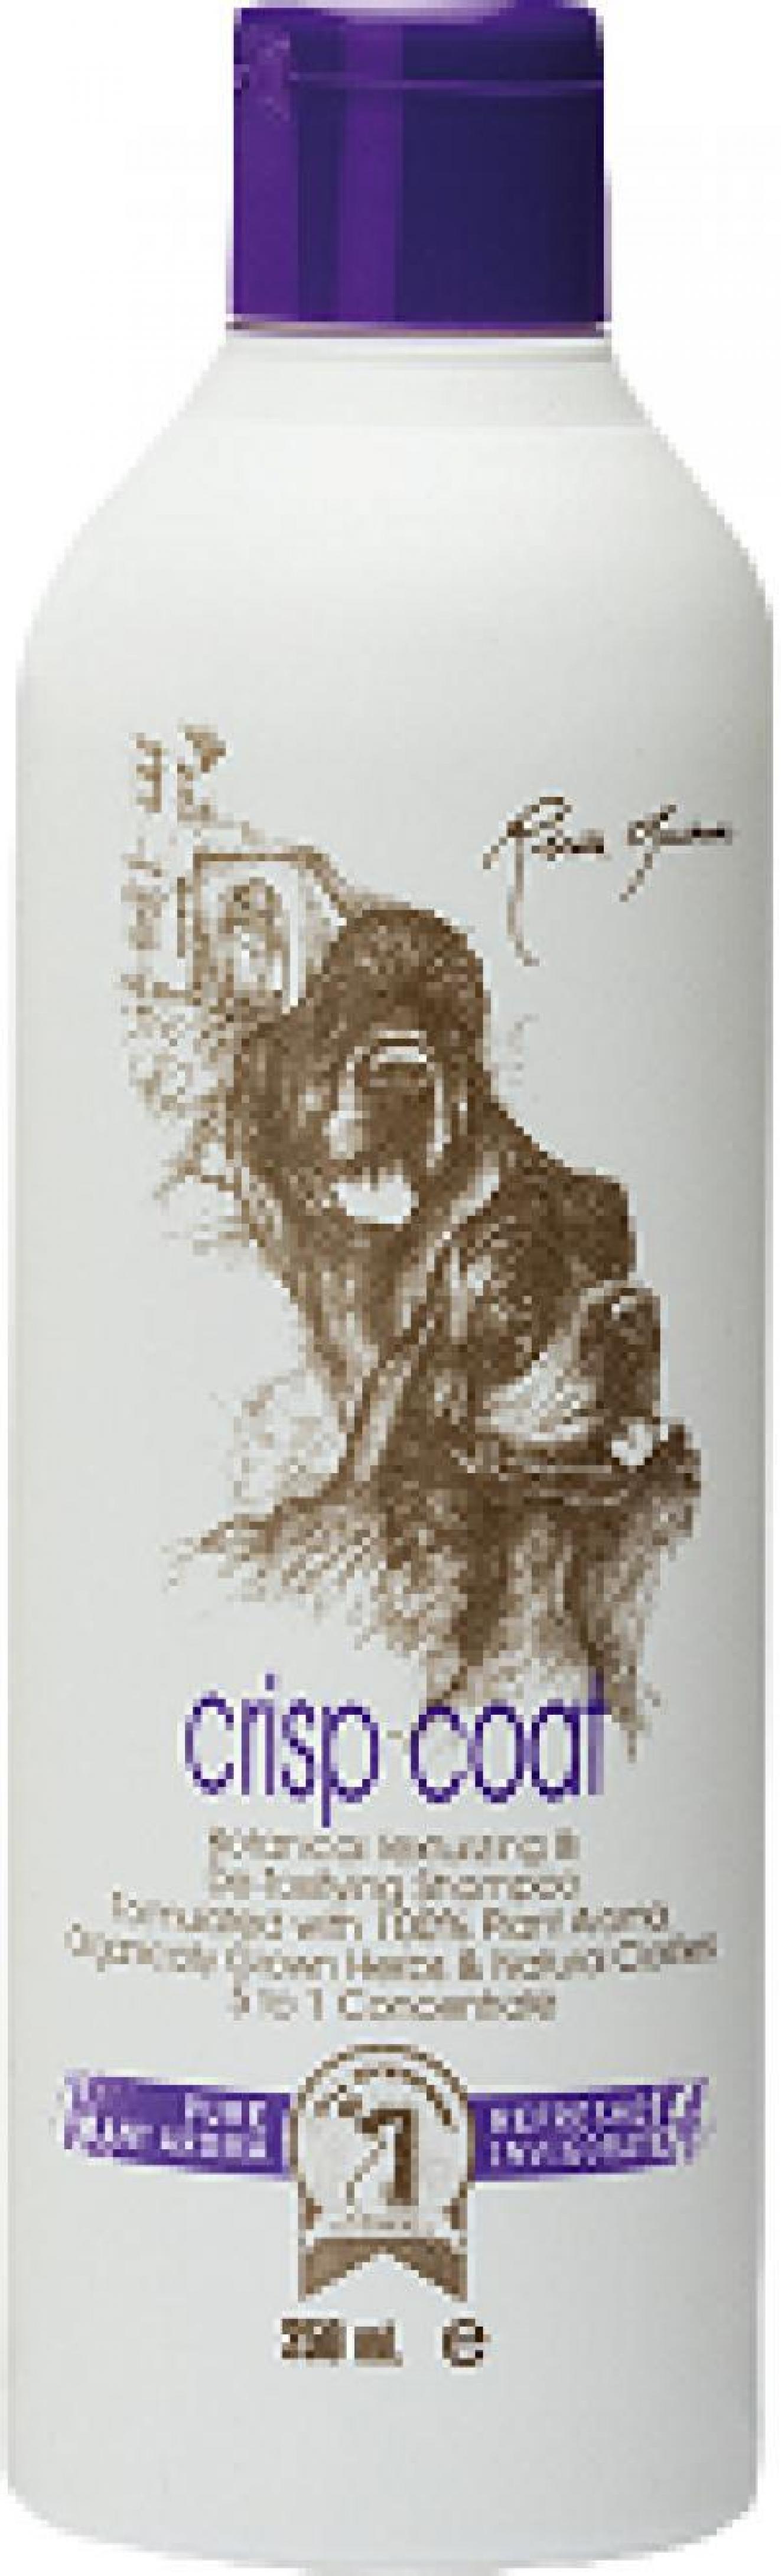 1 All Systems Crisp coat Shampoo шампунь для жесткой шерсти 250 мл, 00301